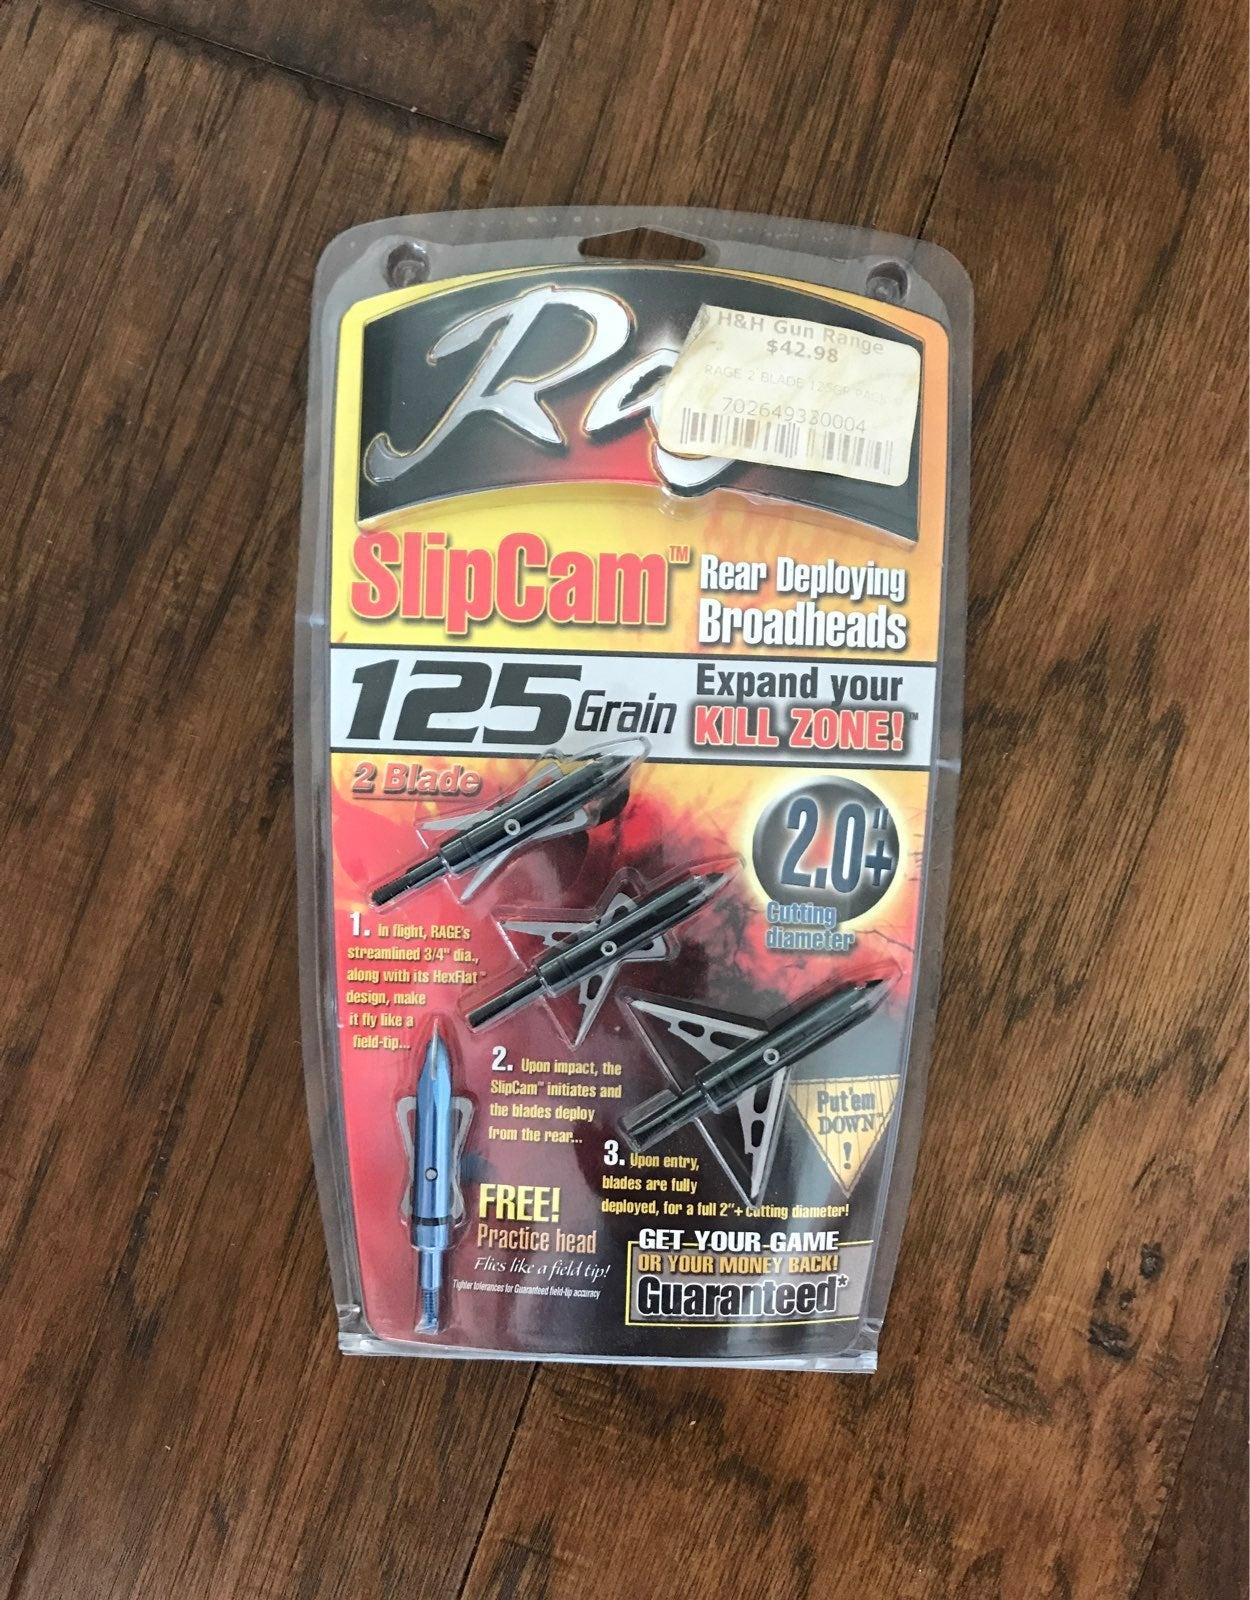 Rage SlipCam Rear Deploying Broadheads